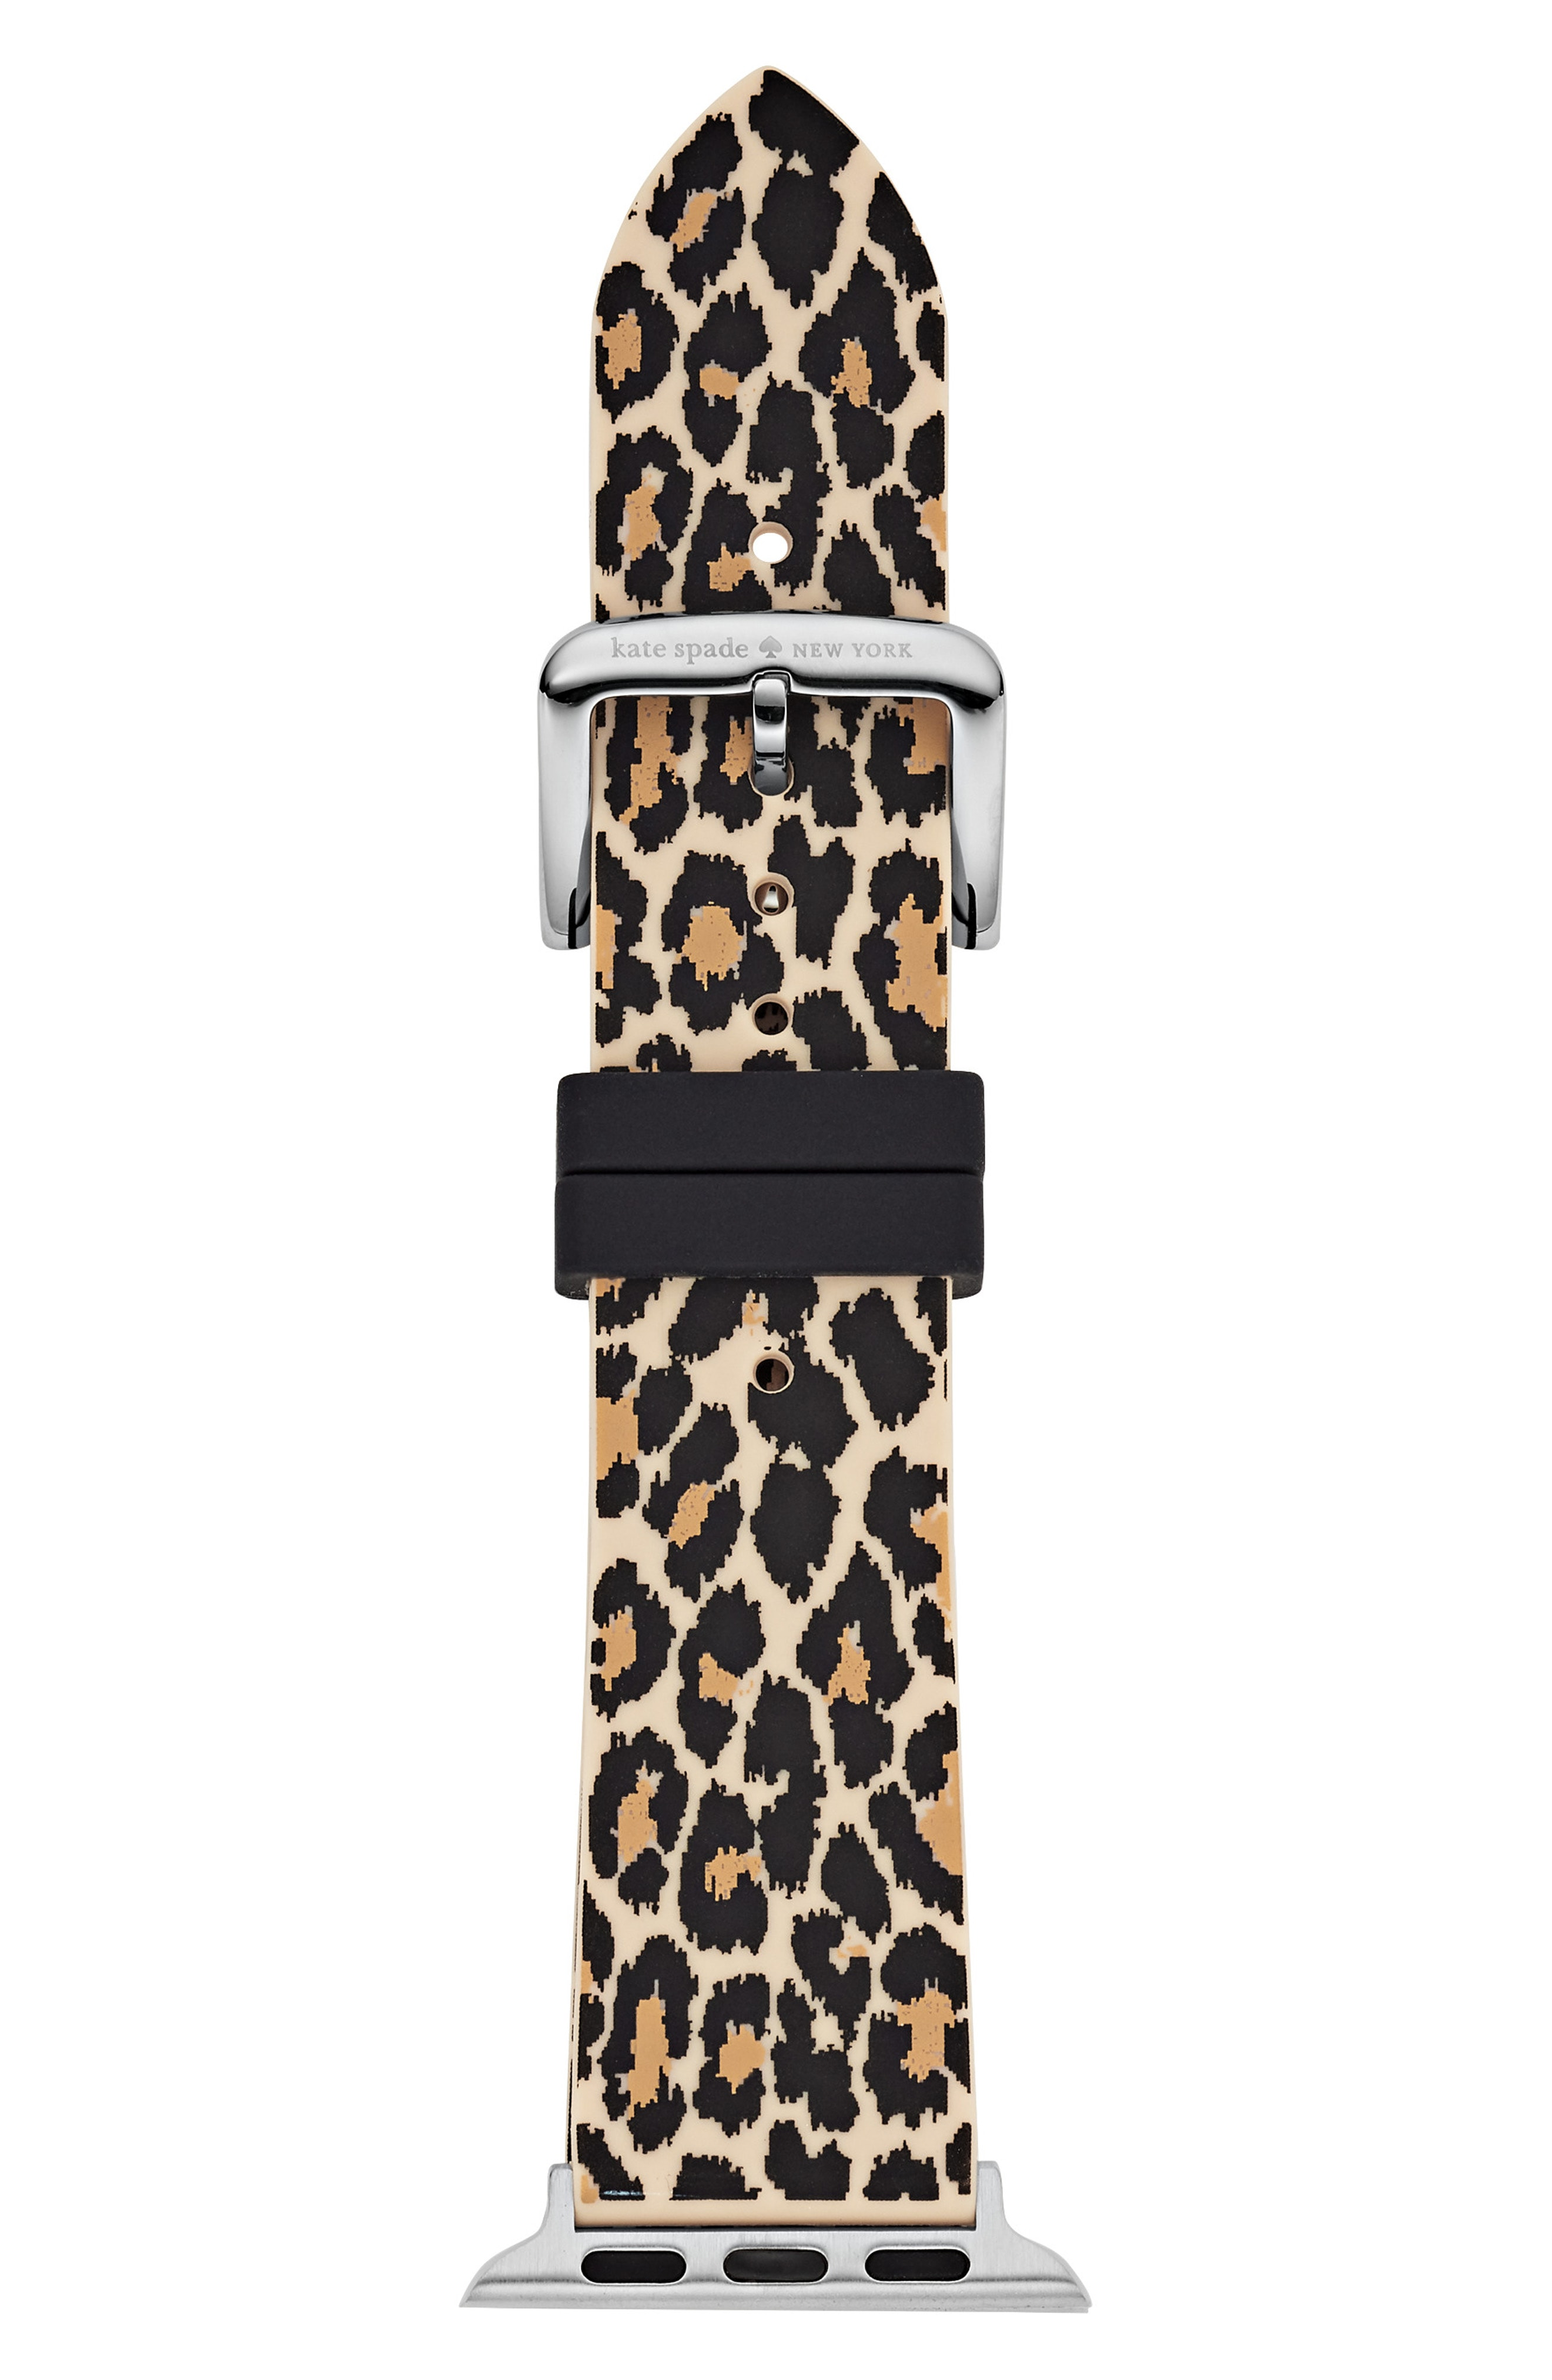 kate spade new york Apple Watch strap, 38mm